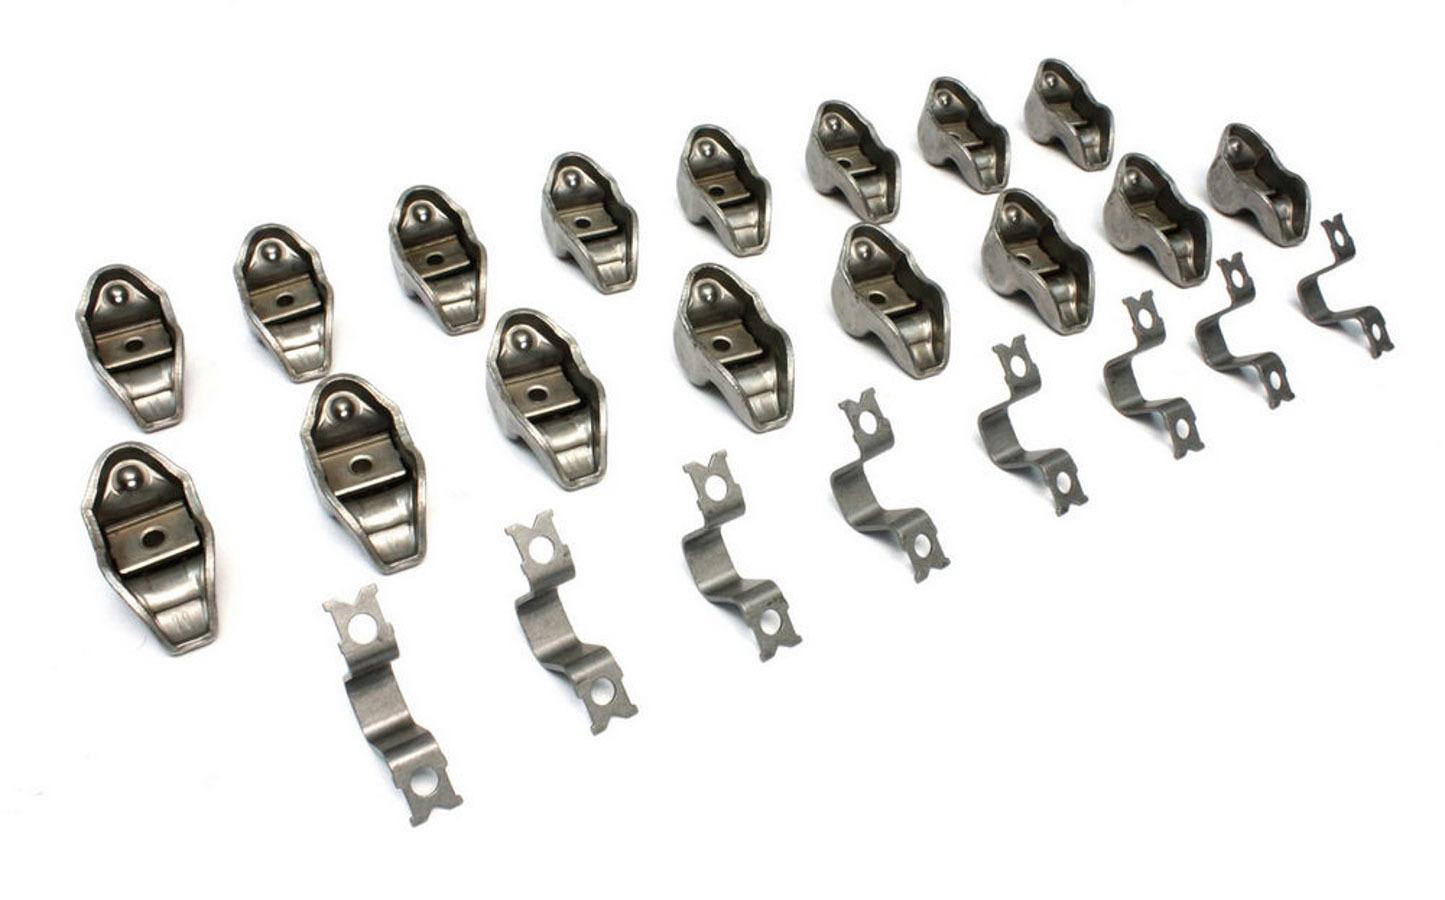 Comp Cams 1210-16 Rocker Arm, High Energy, Pedestal Mount, 1.60 Ratio, Steel, AMC V8, Set of 16